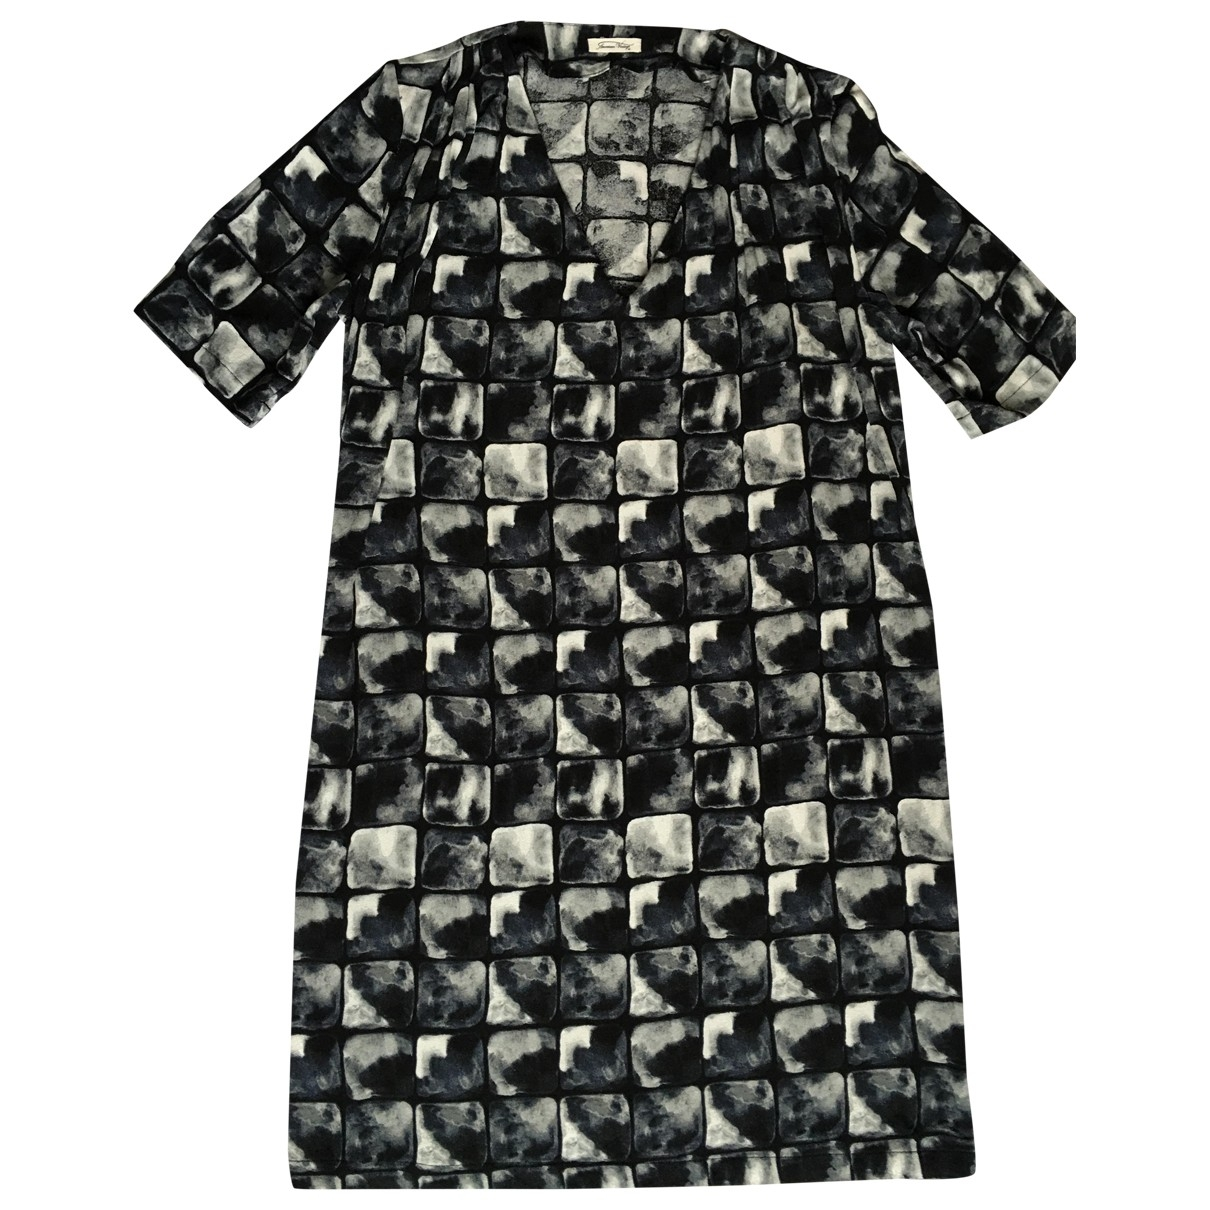 American Vintage \N Grey dress for Women S International